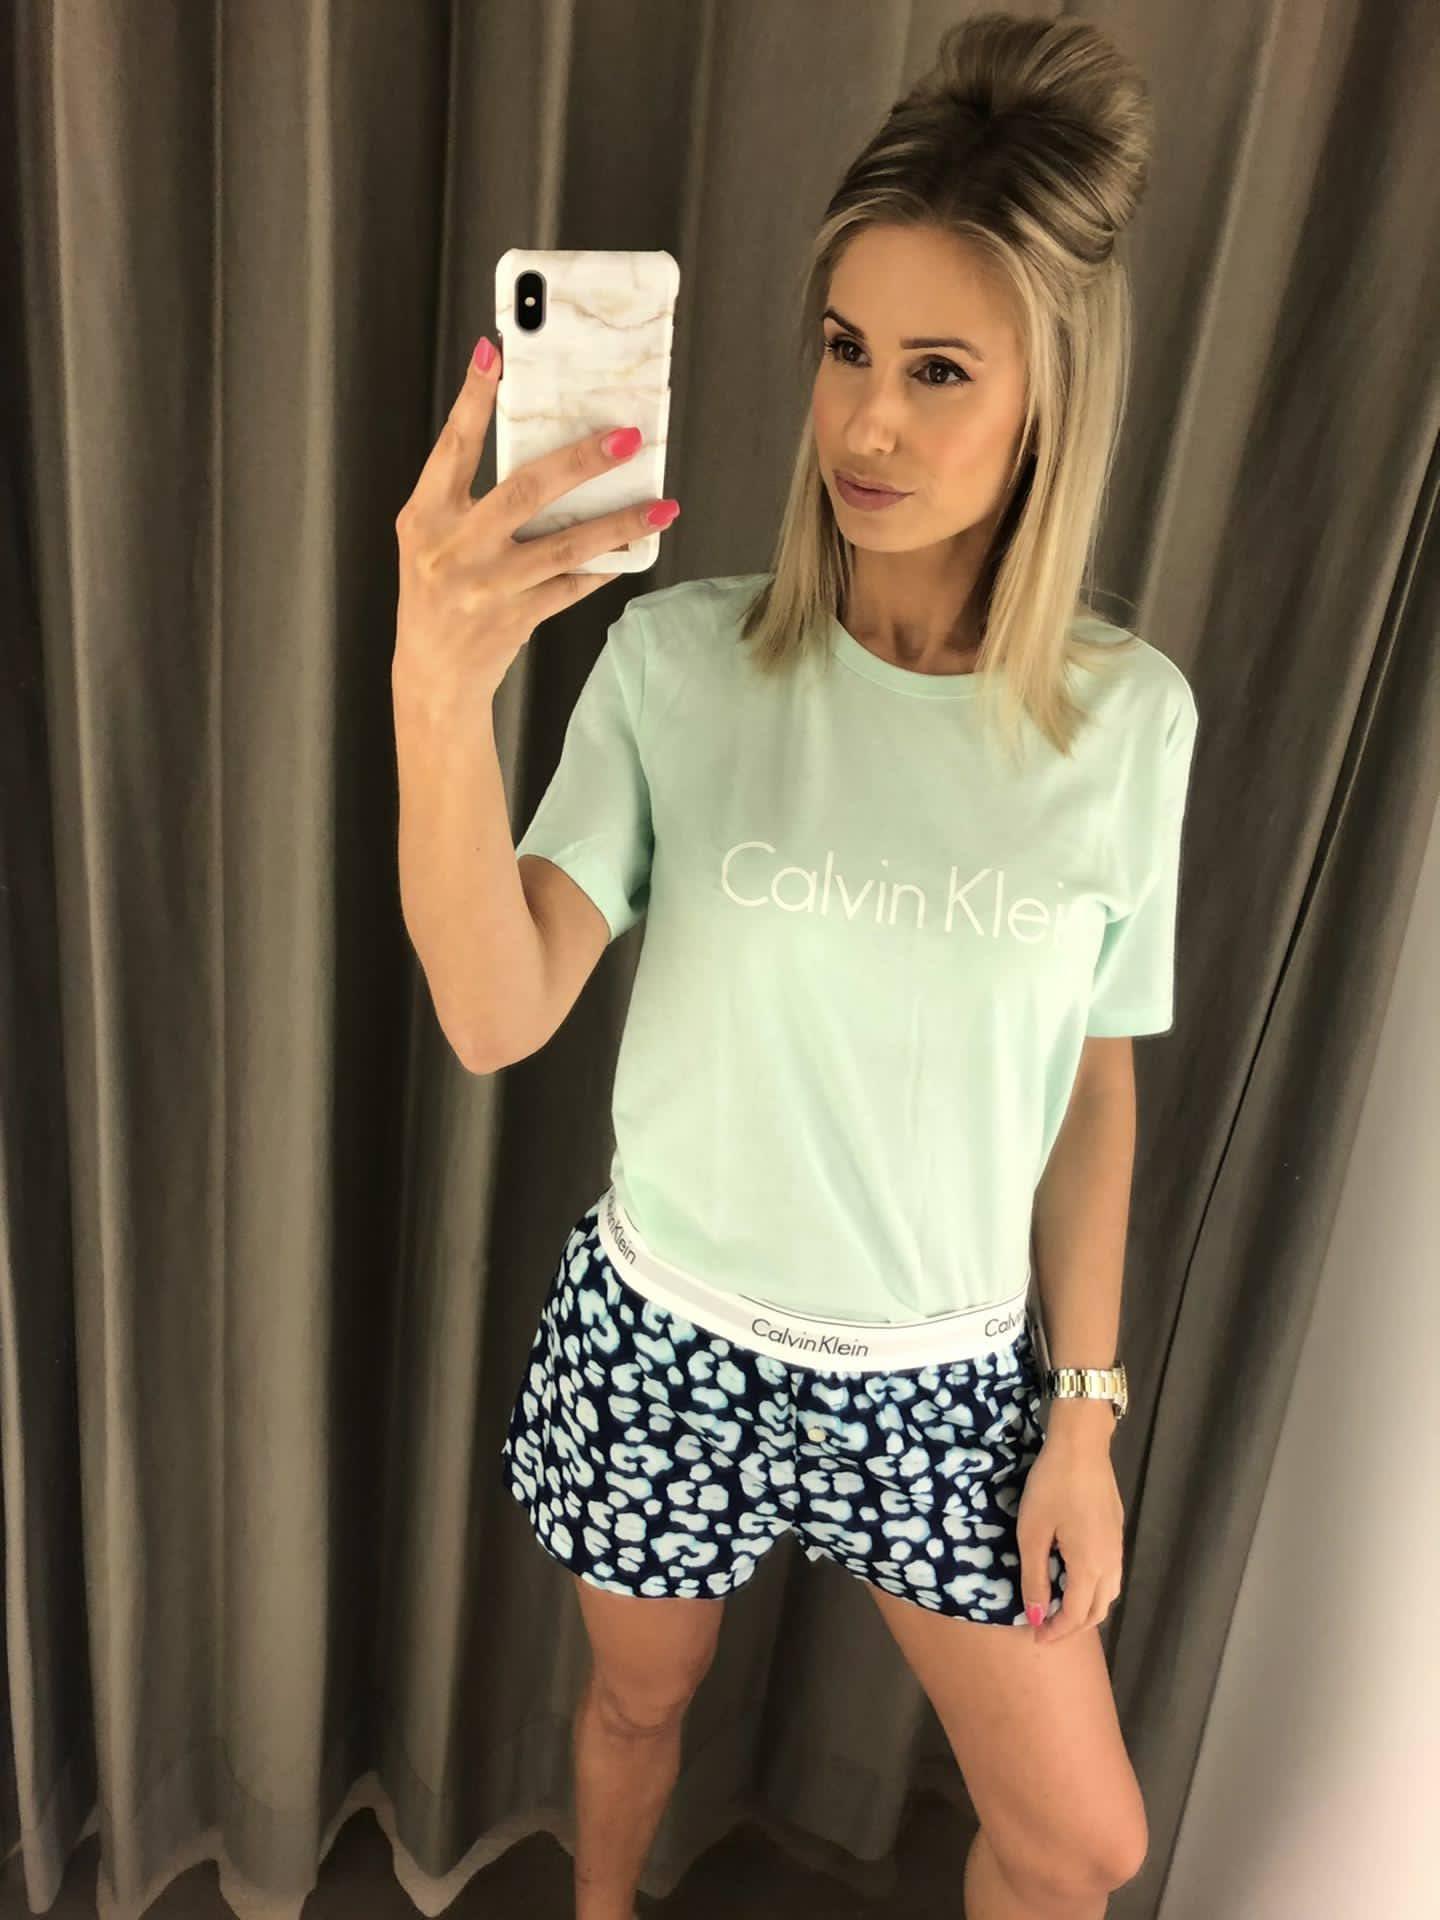 Calvin Klein Leopard Slaapset Tshirt + shortje